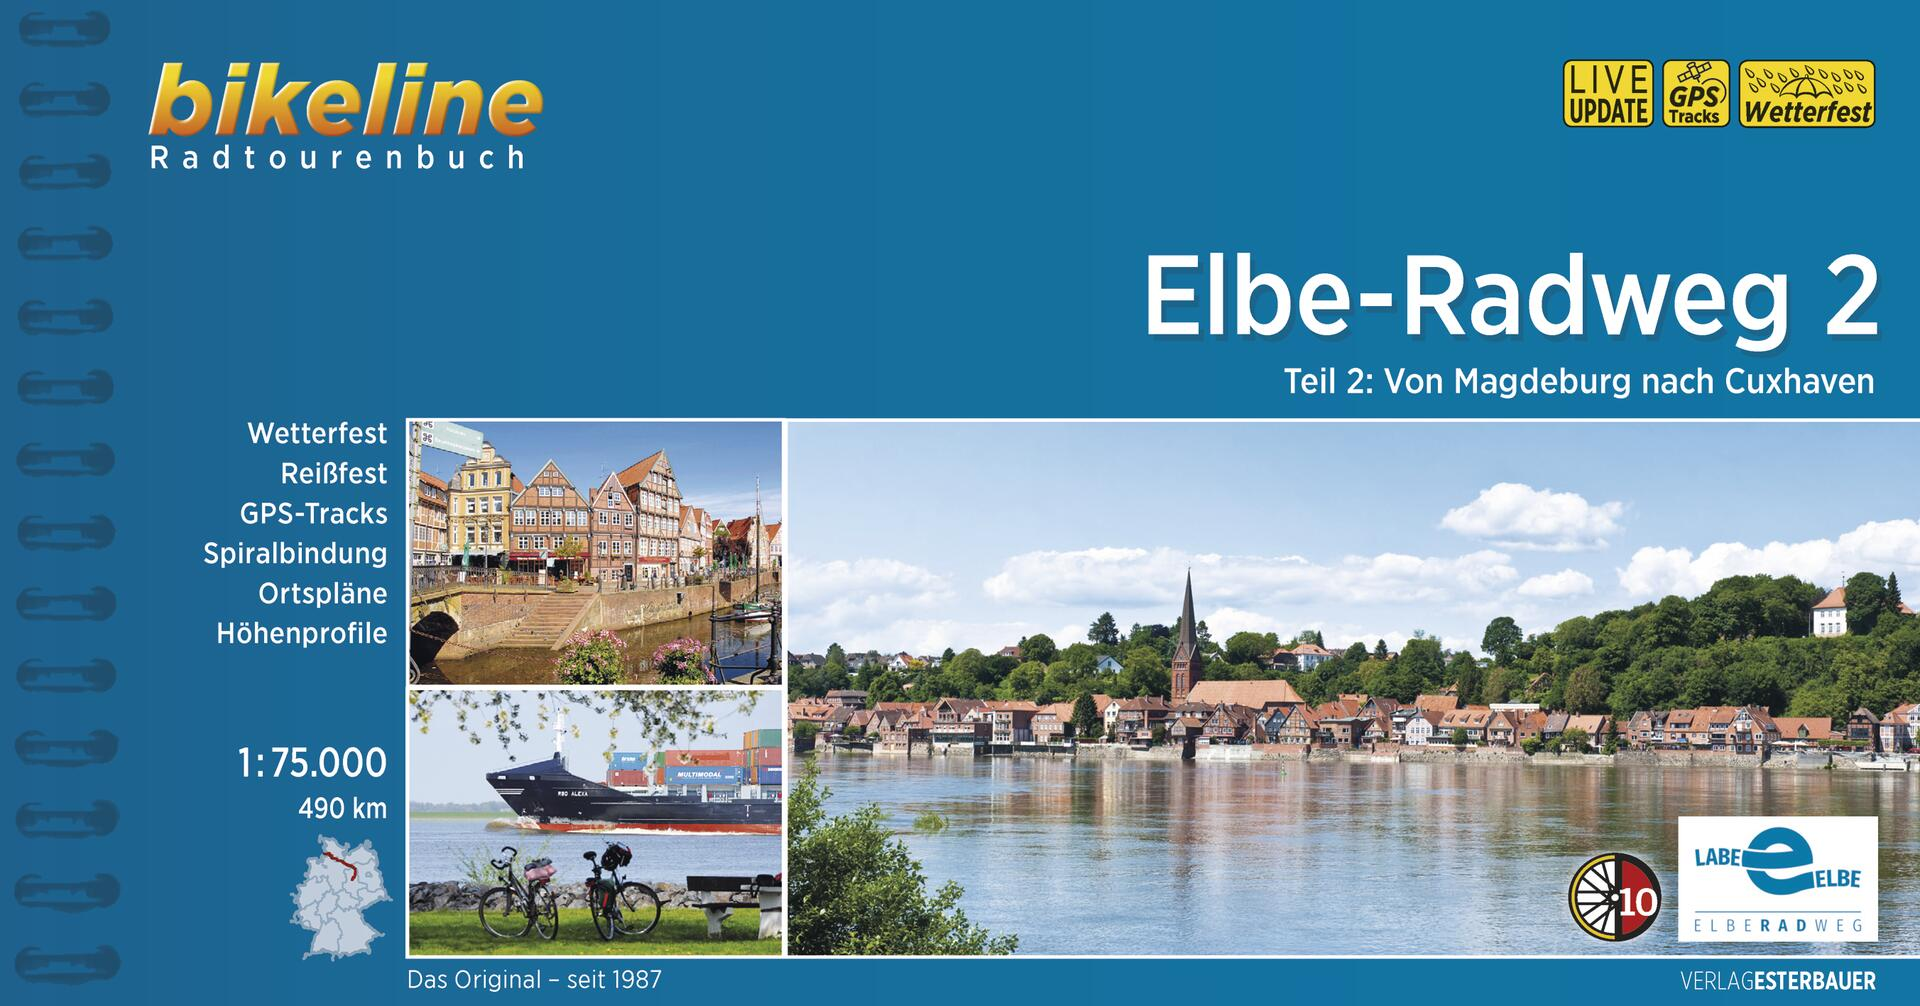 Foto vom Elbe-Radweg 2